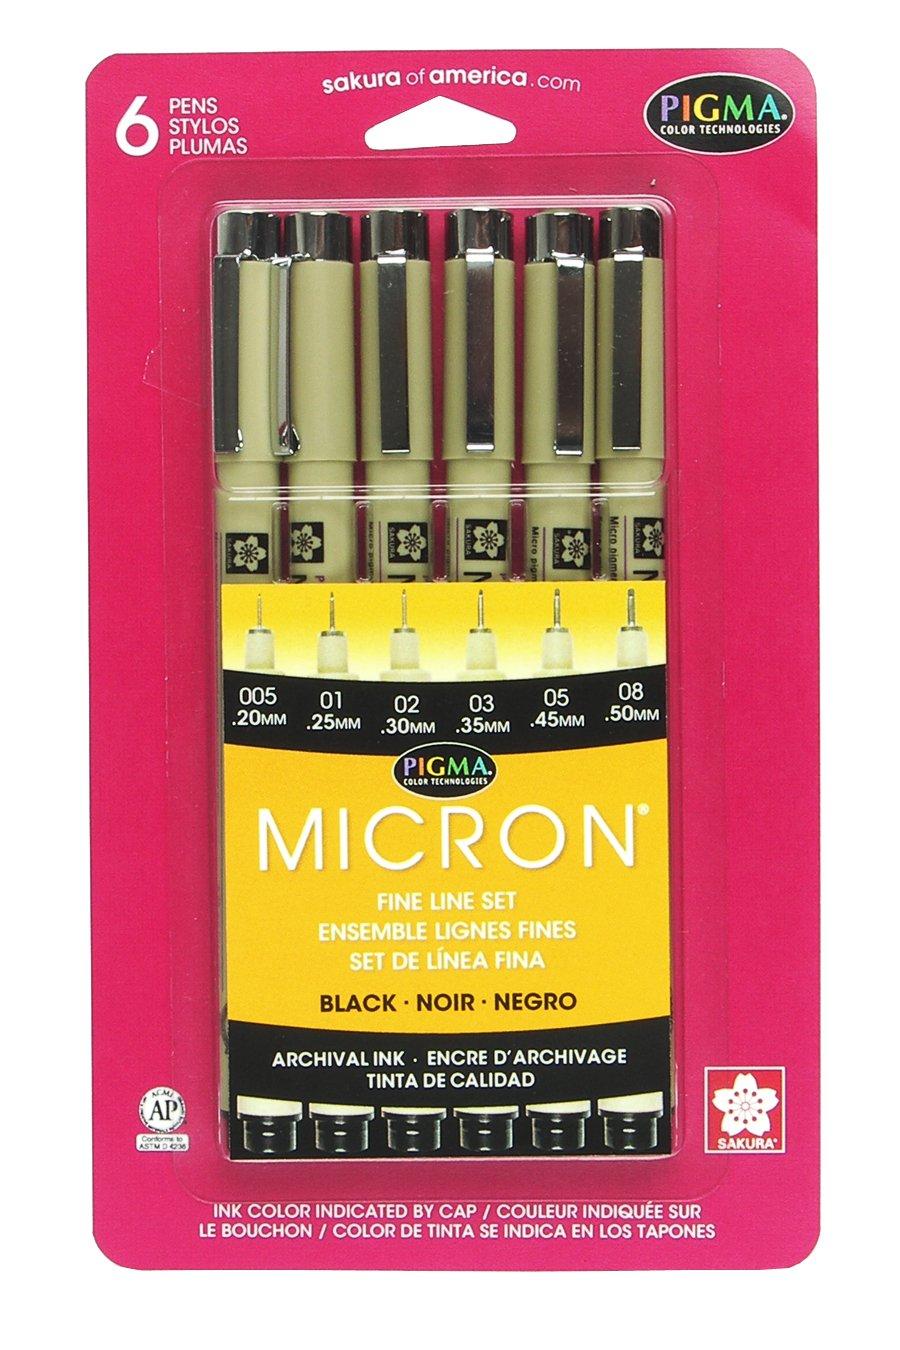 Sakura Pigma 30062 Micron Blister Card Ink Pen Set, Black,.